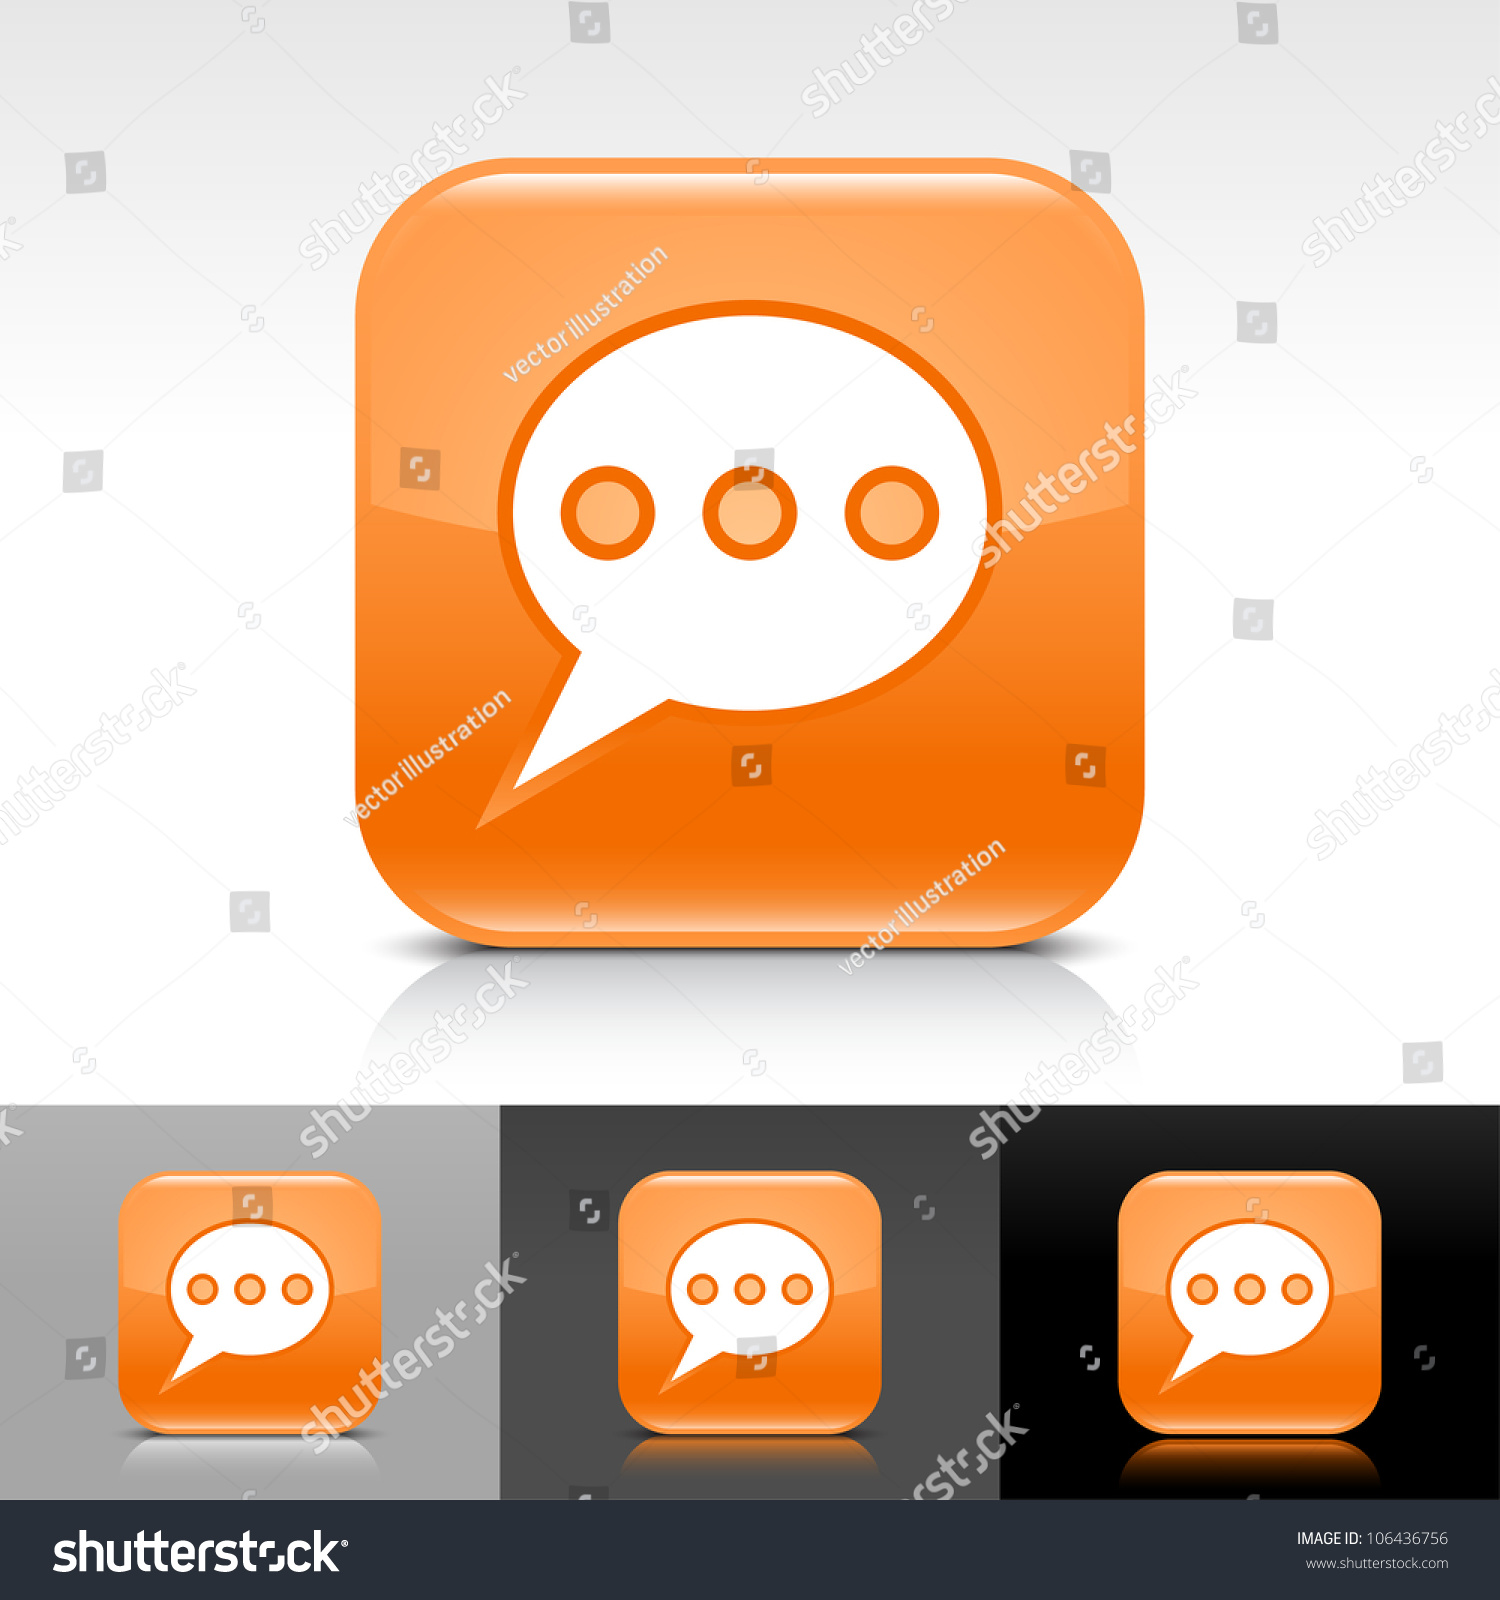 Free black chat sites